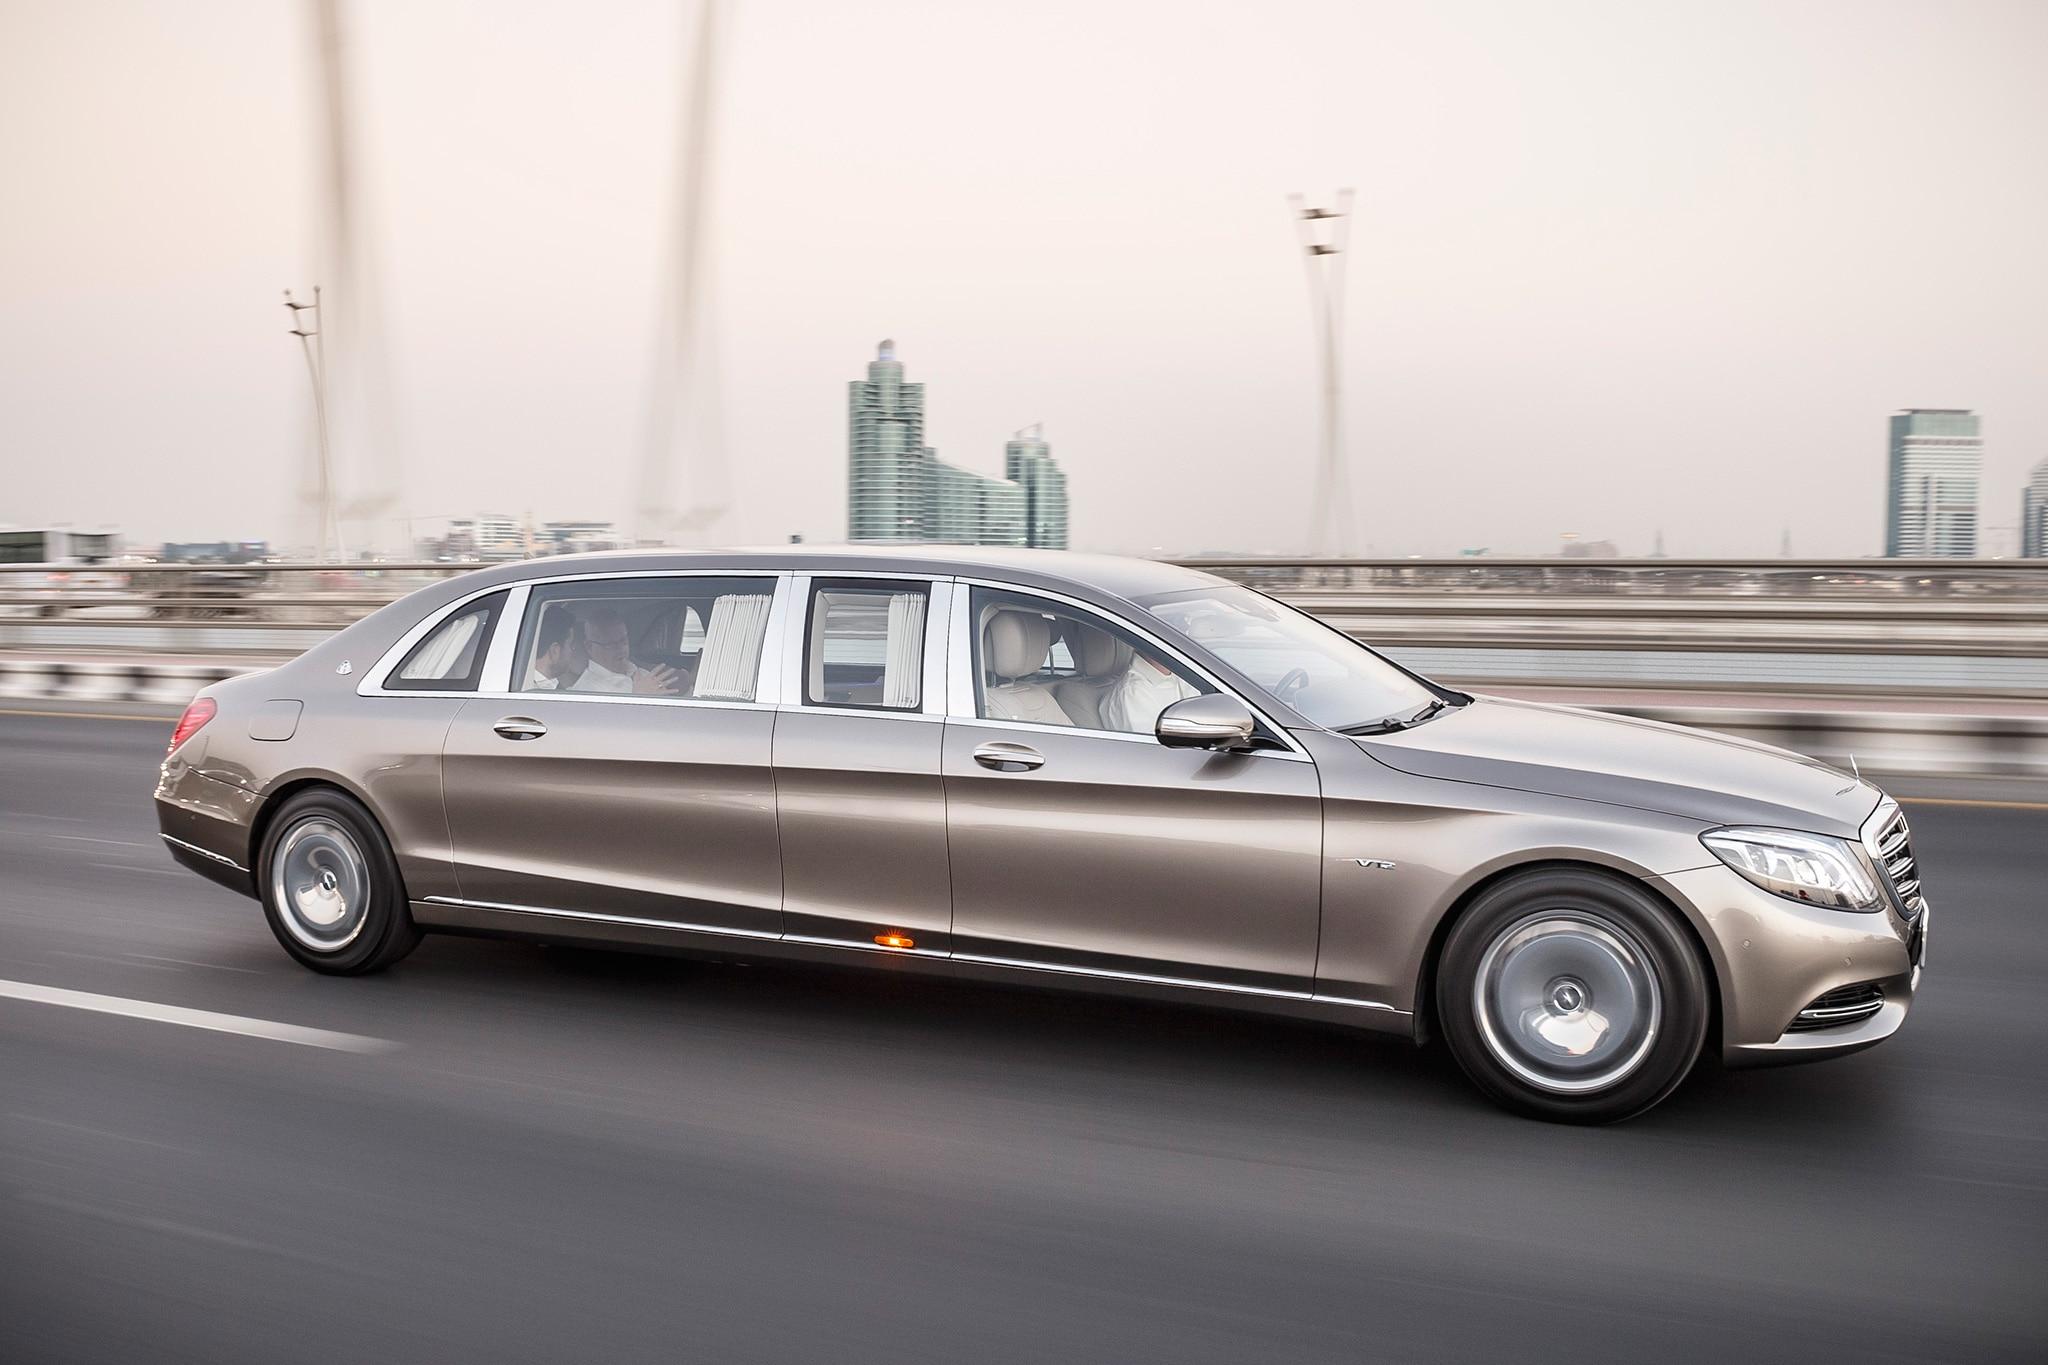 Mercedes Maybach Price In Dubai